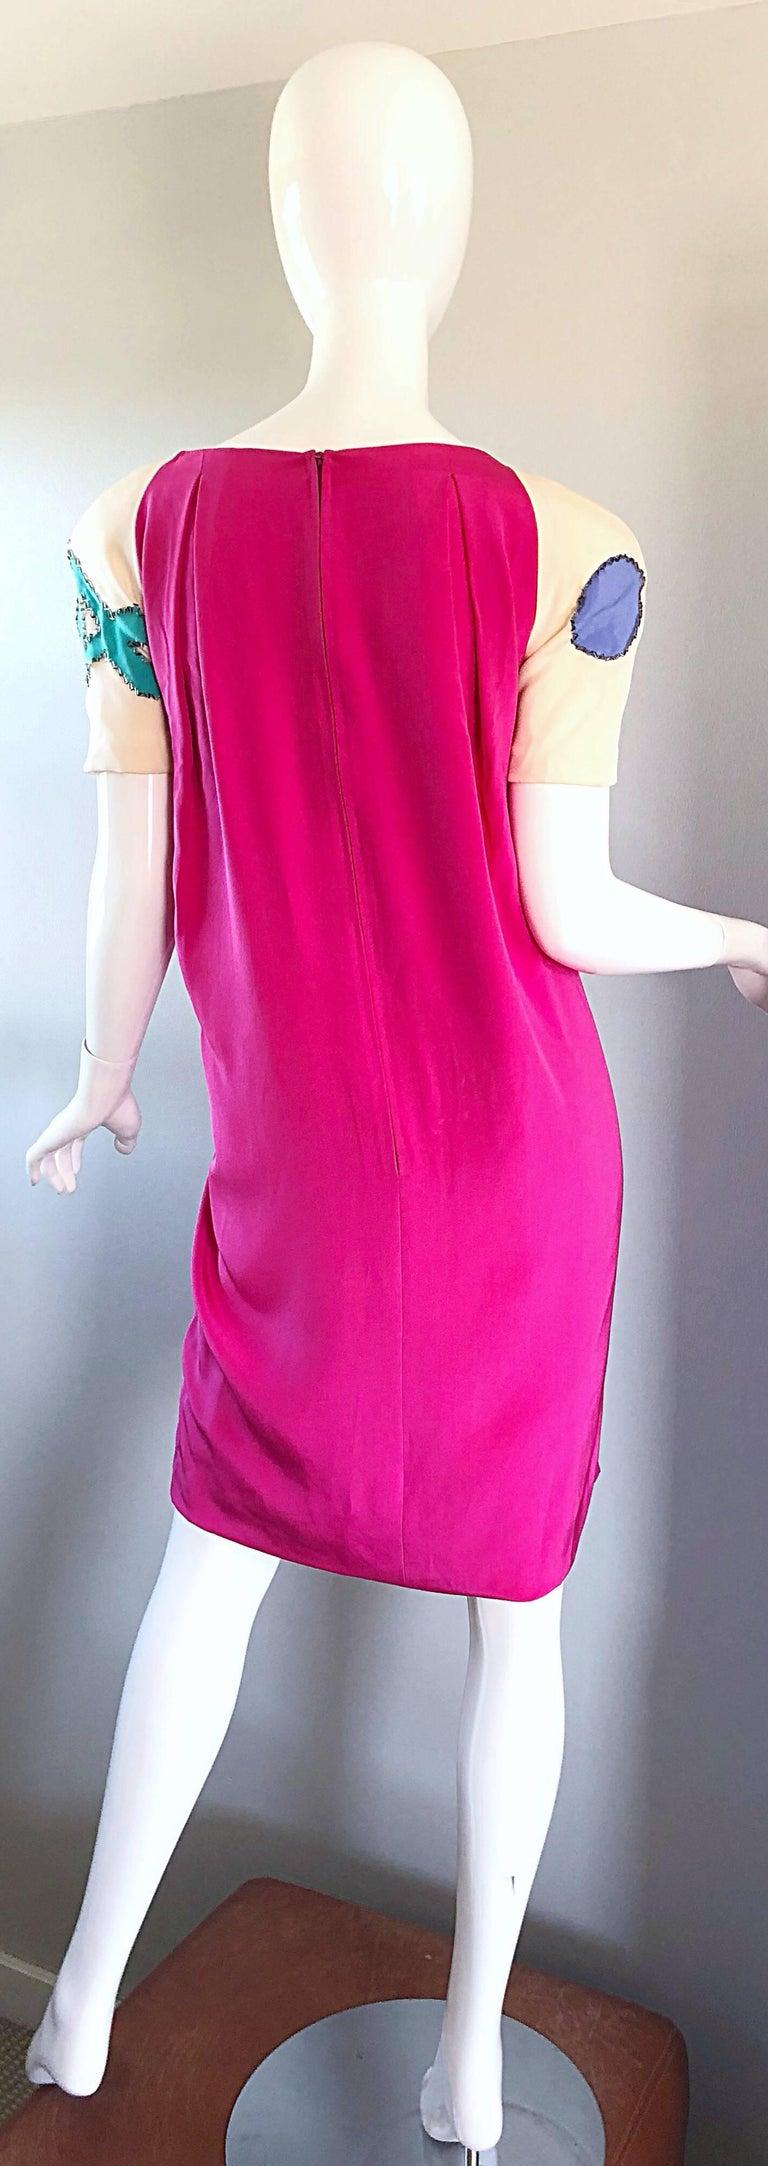 Vintage Bob Mackie Size 12 / 14 Hot Pink Ivory 1990s Short Sleeve 90s Silk Dress For Sale 4